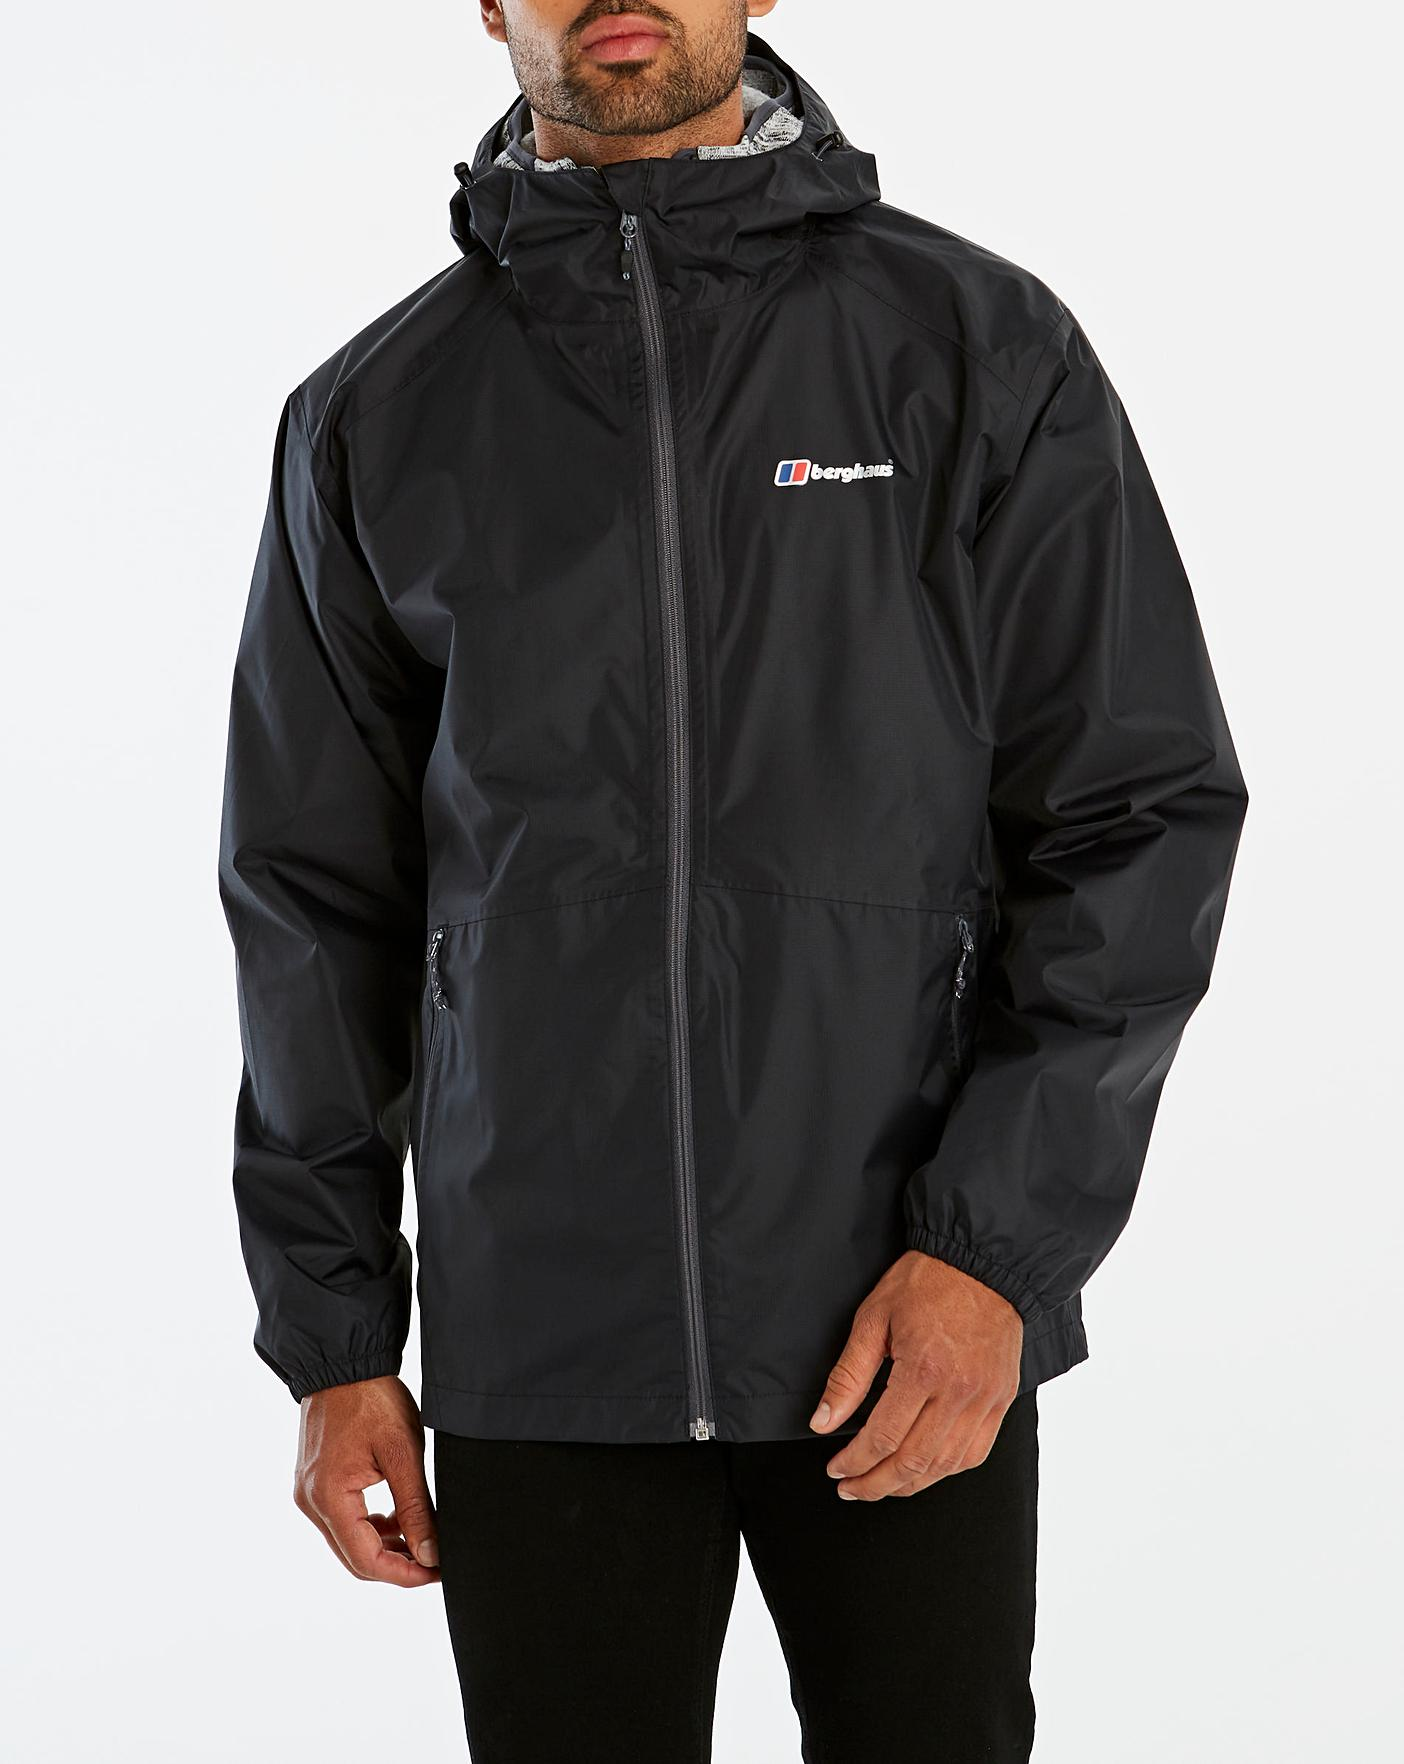 info for b85fb 54e1f Berghaus Deluge Light Waterproof Jacket